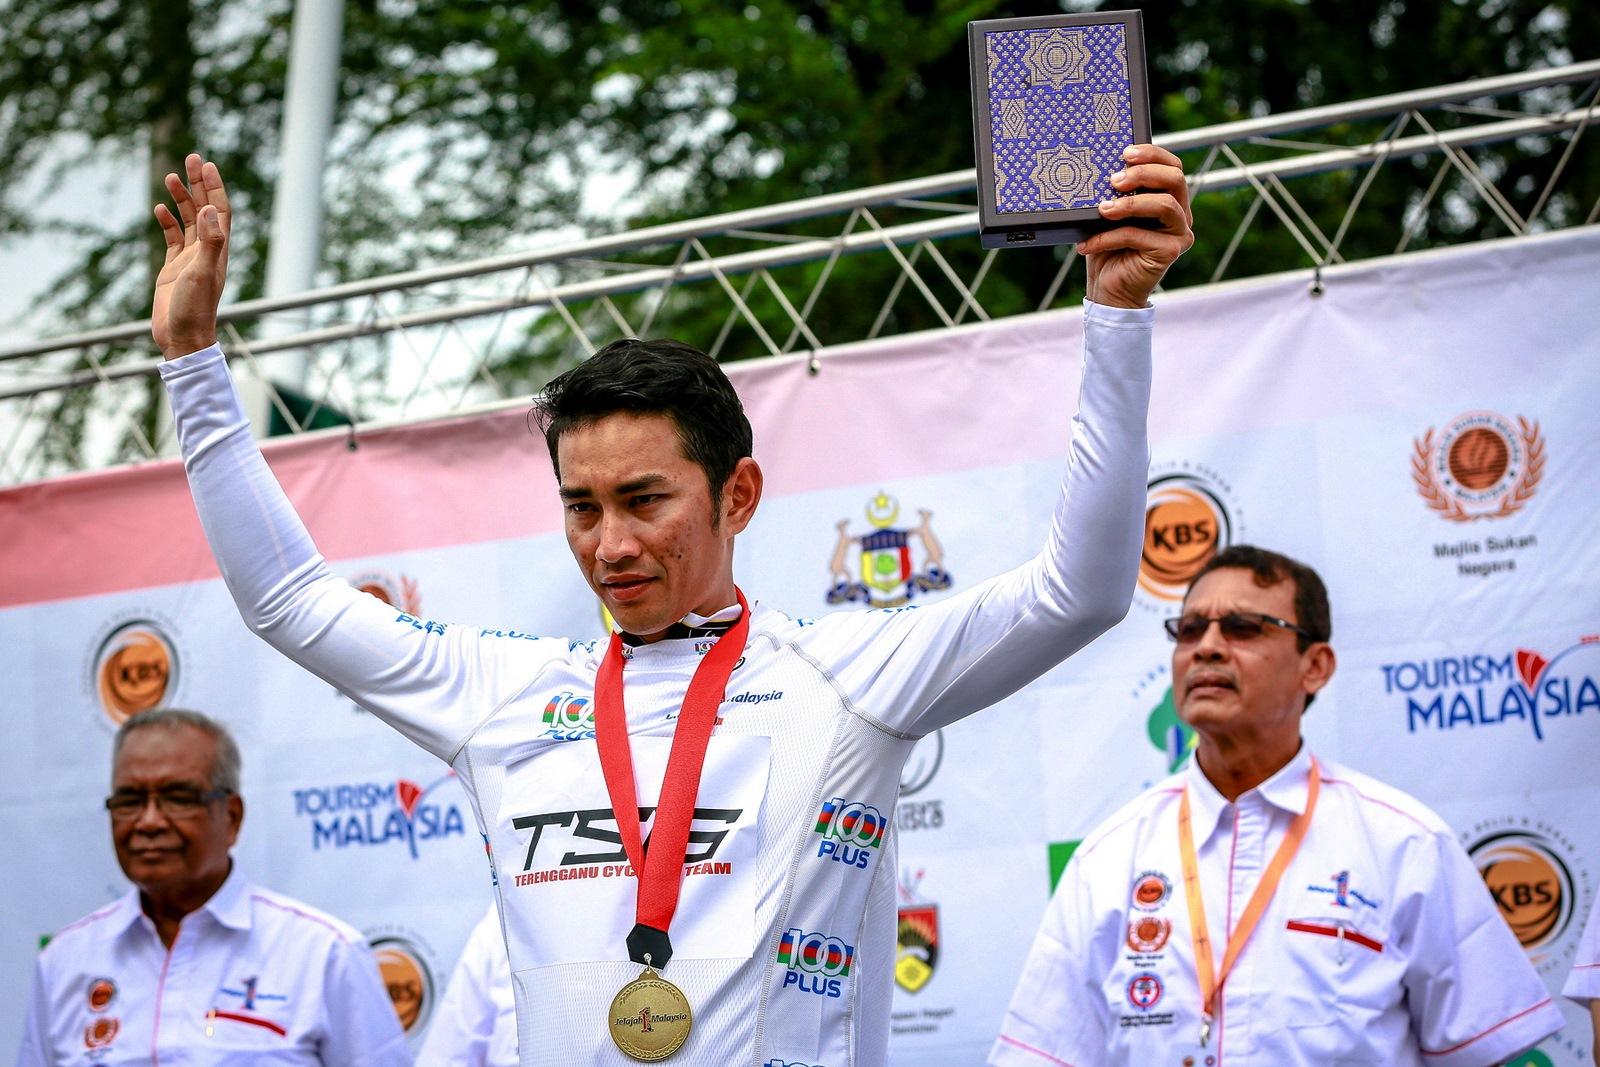 Jelajah Malaysia 2014 - Terengganu Cycling Team - Muhd Shaiful Anwar Azis